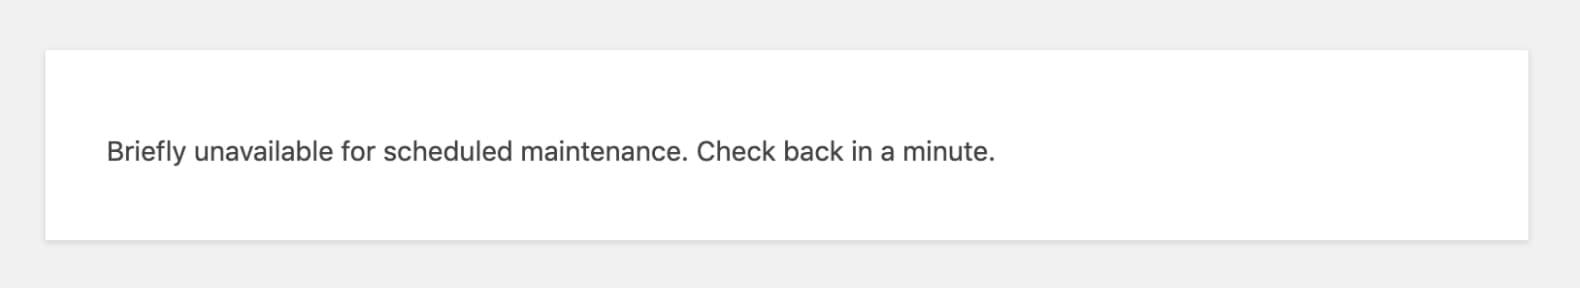 Briefly unavailable for scheduled maintenance - WordPress